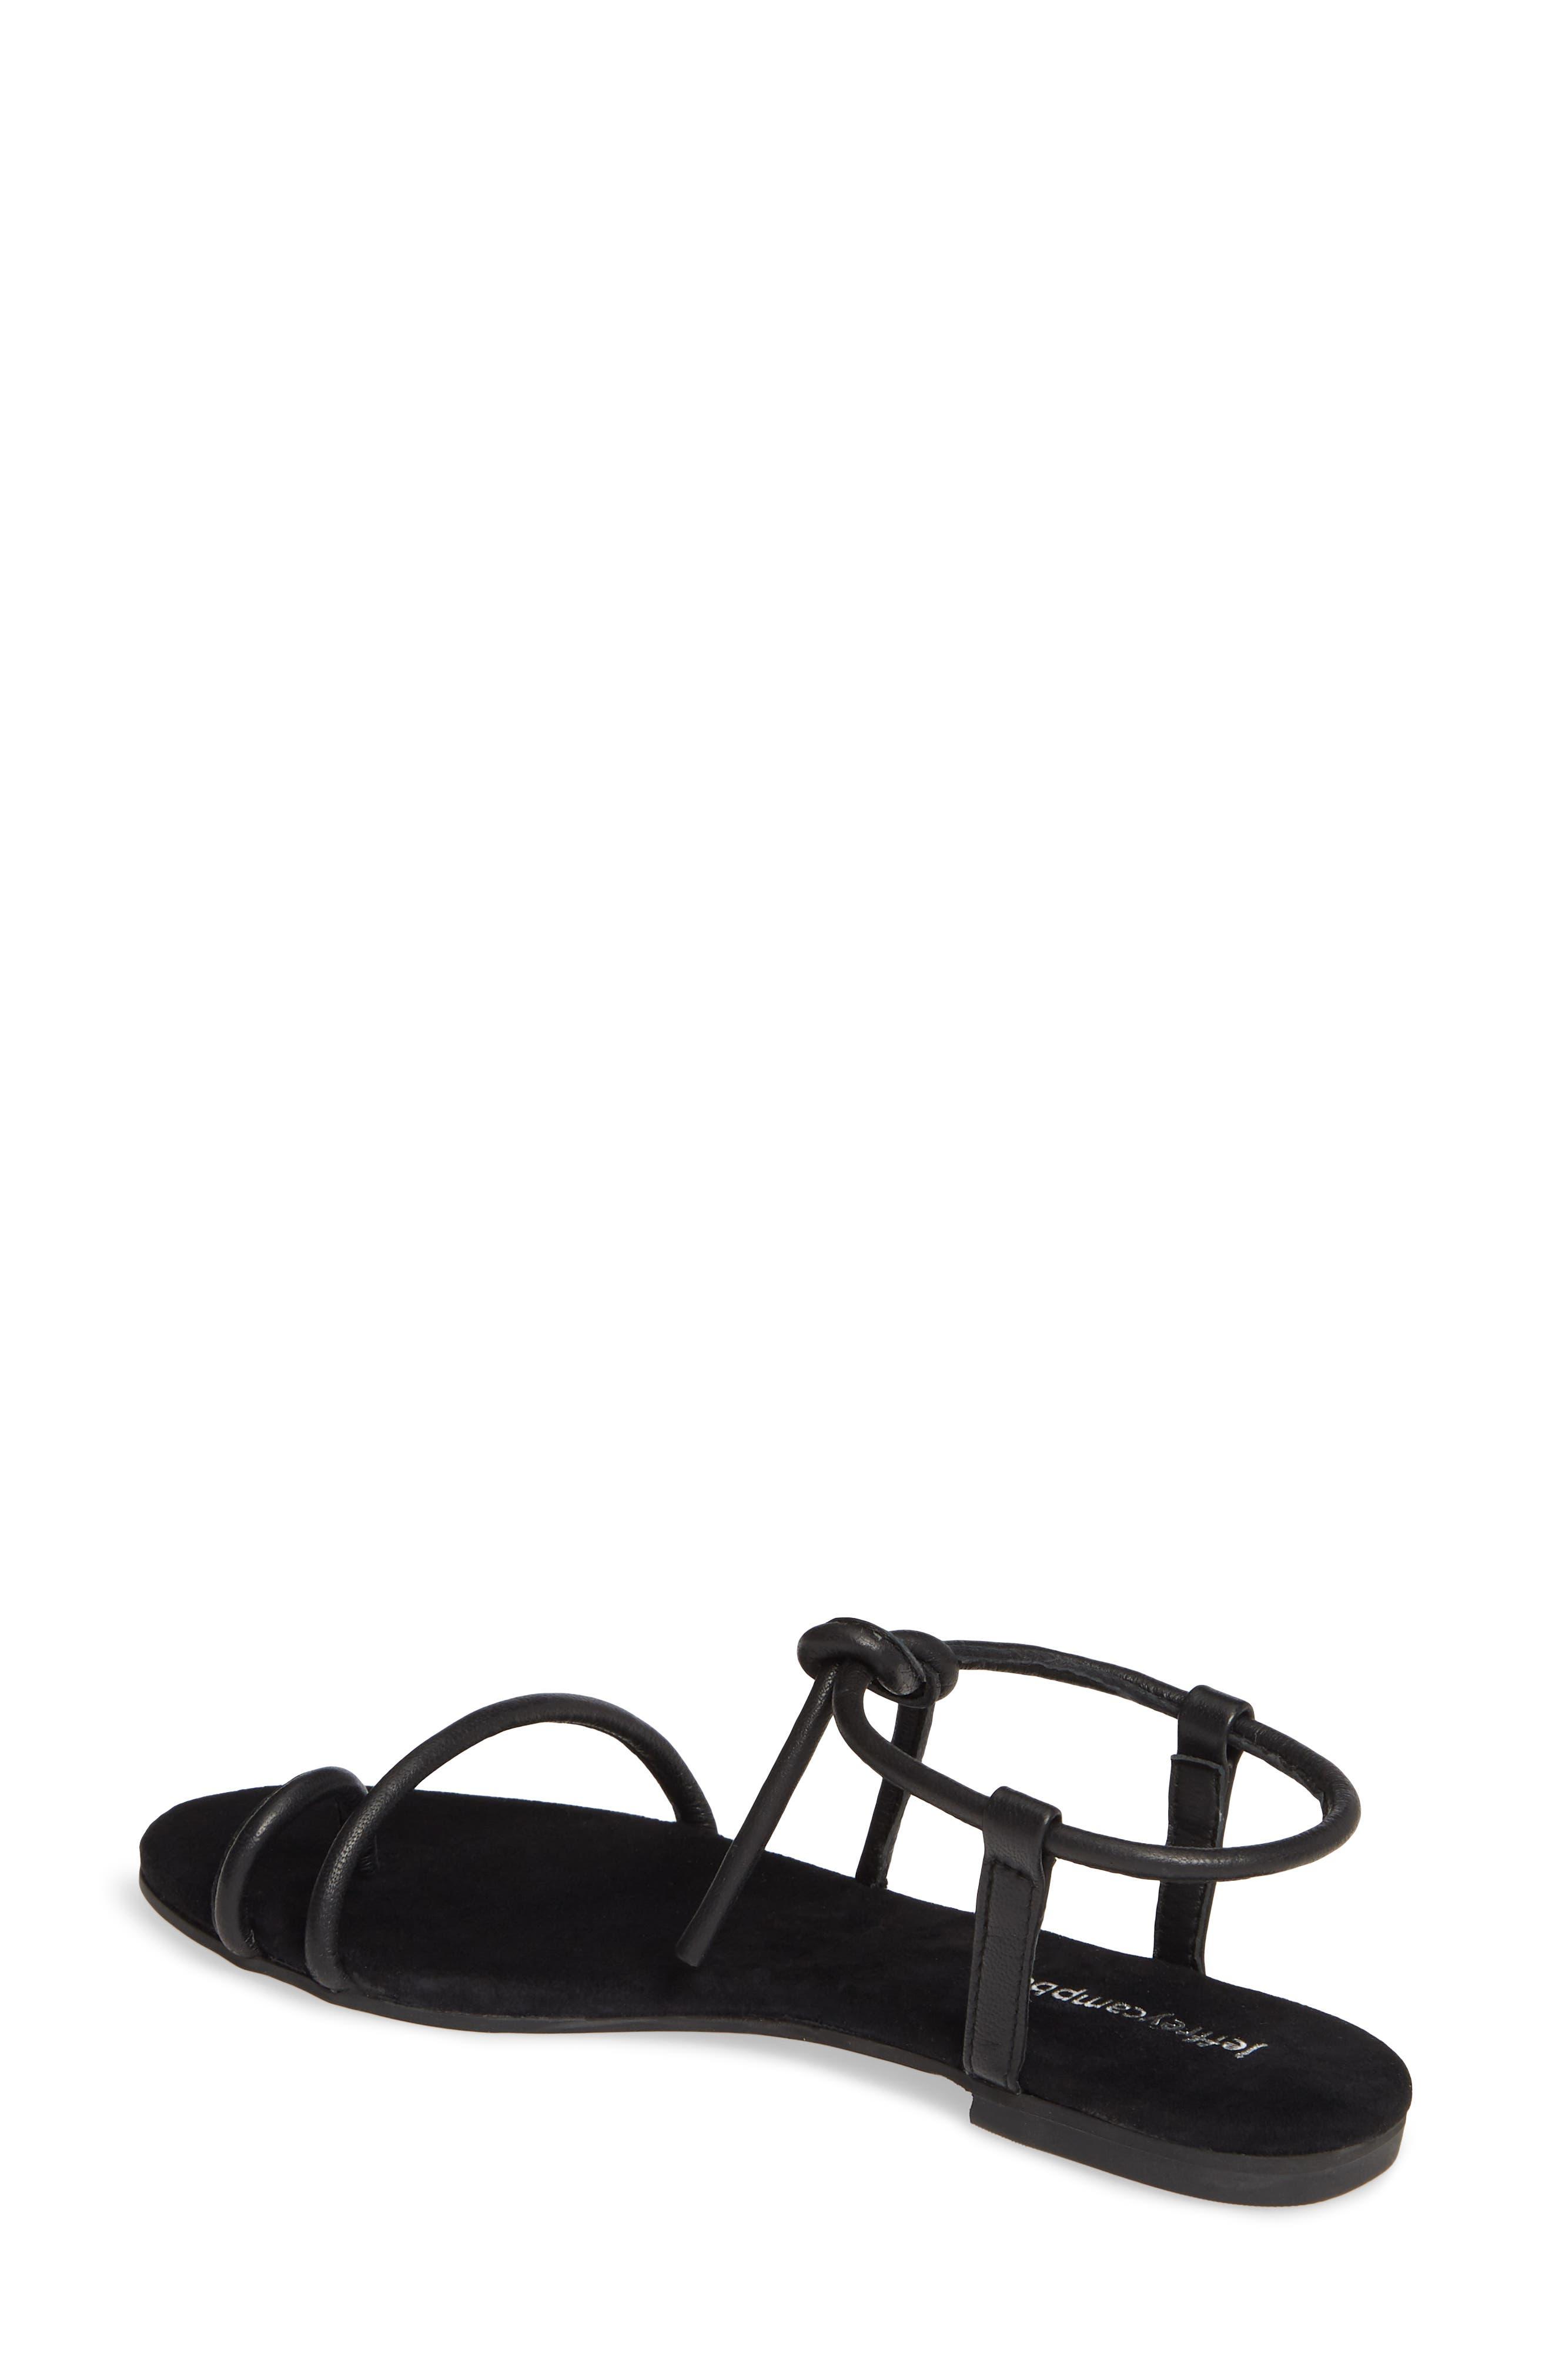 JEFFREY CAMPBELL, Aster Tie Sandal, Alternate thumbnail 2, color, BLACK LEATHER